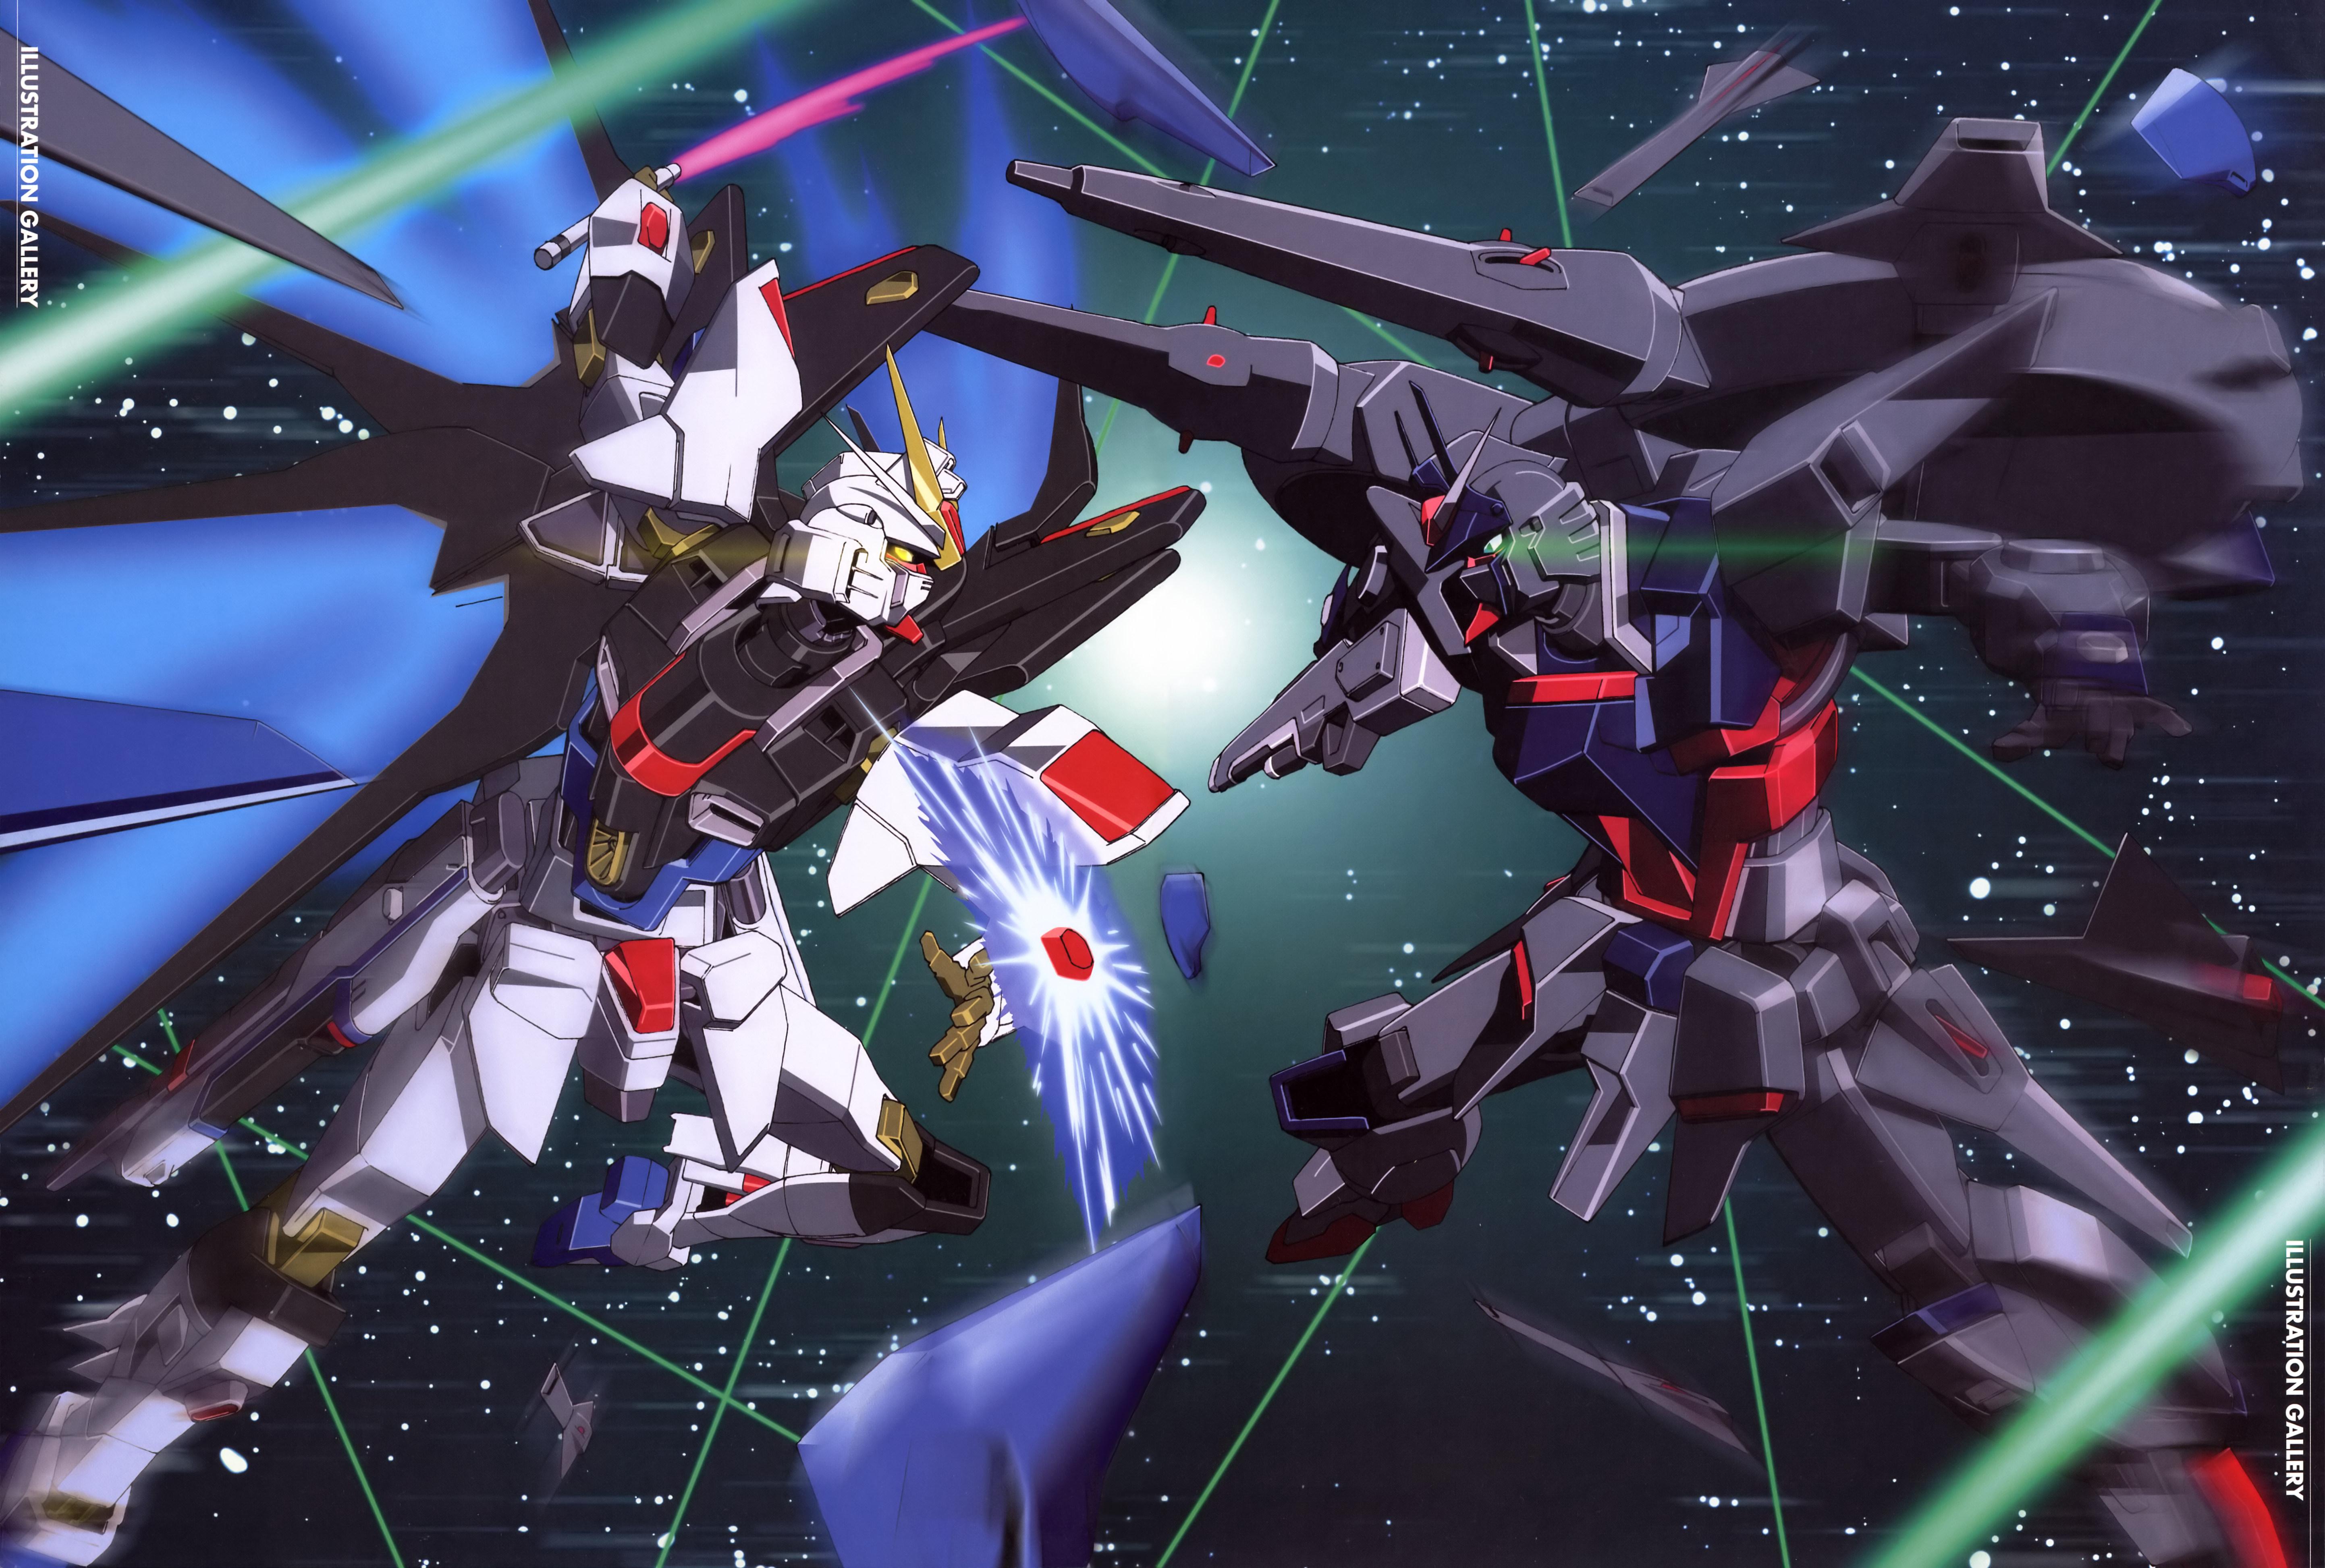 Mobile Suit Gundam SEED Destiny: Legend vs. Strike Freedom ...